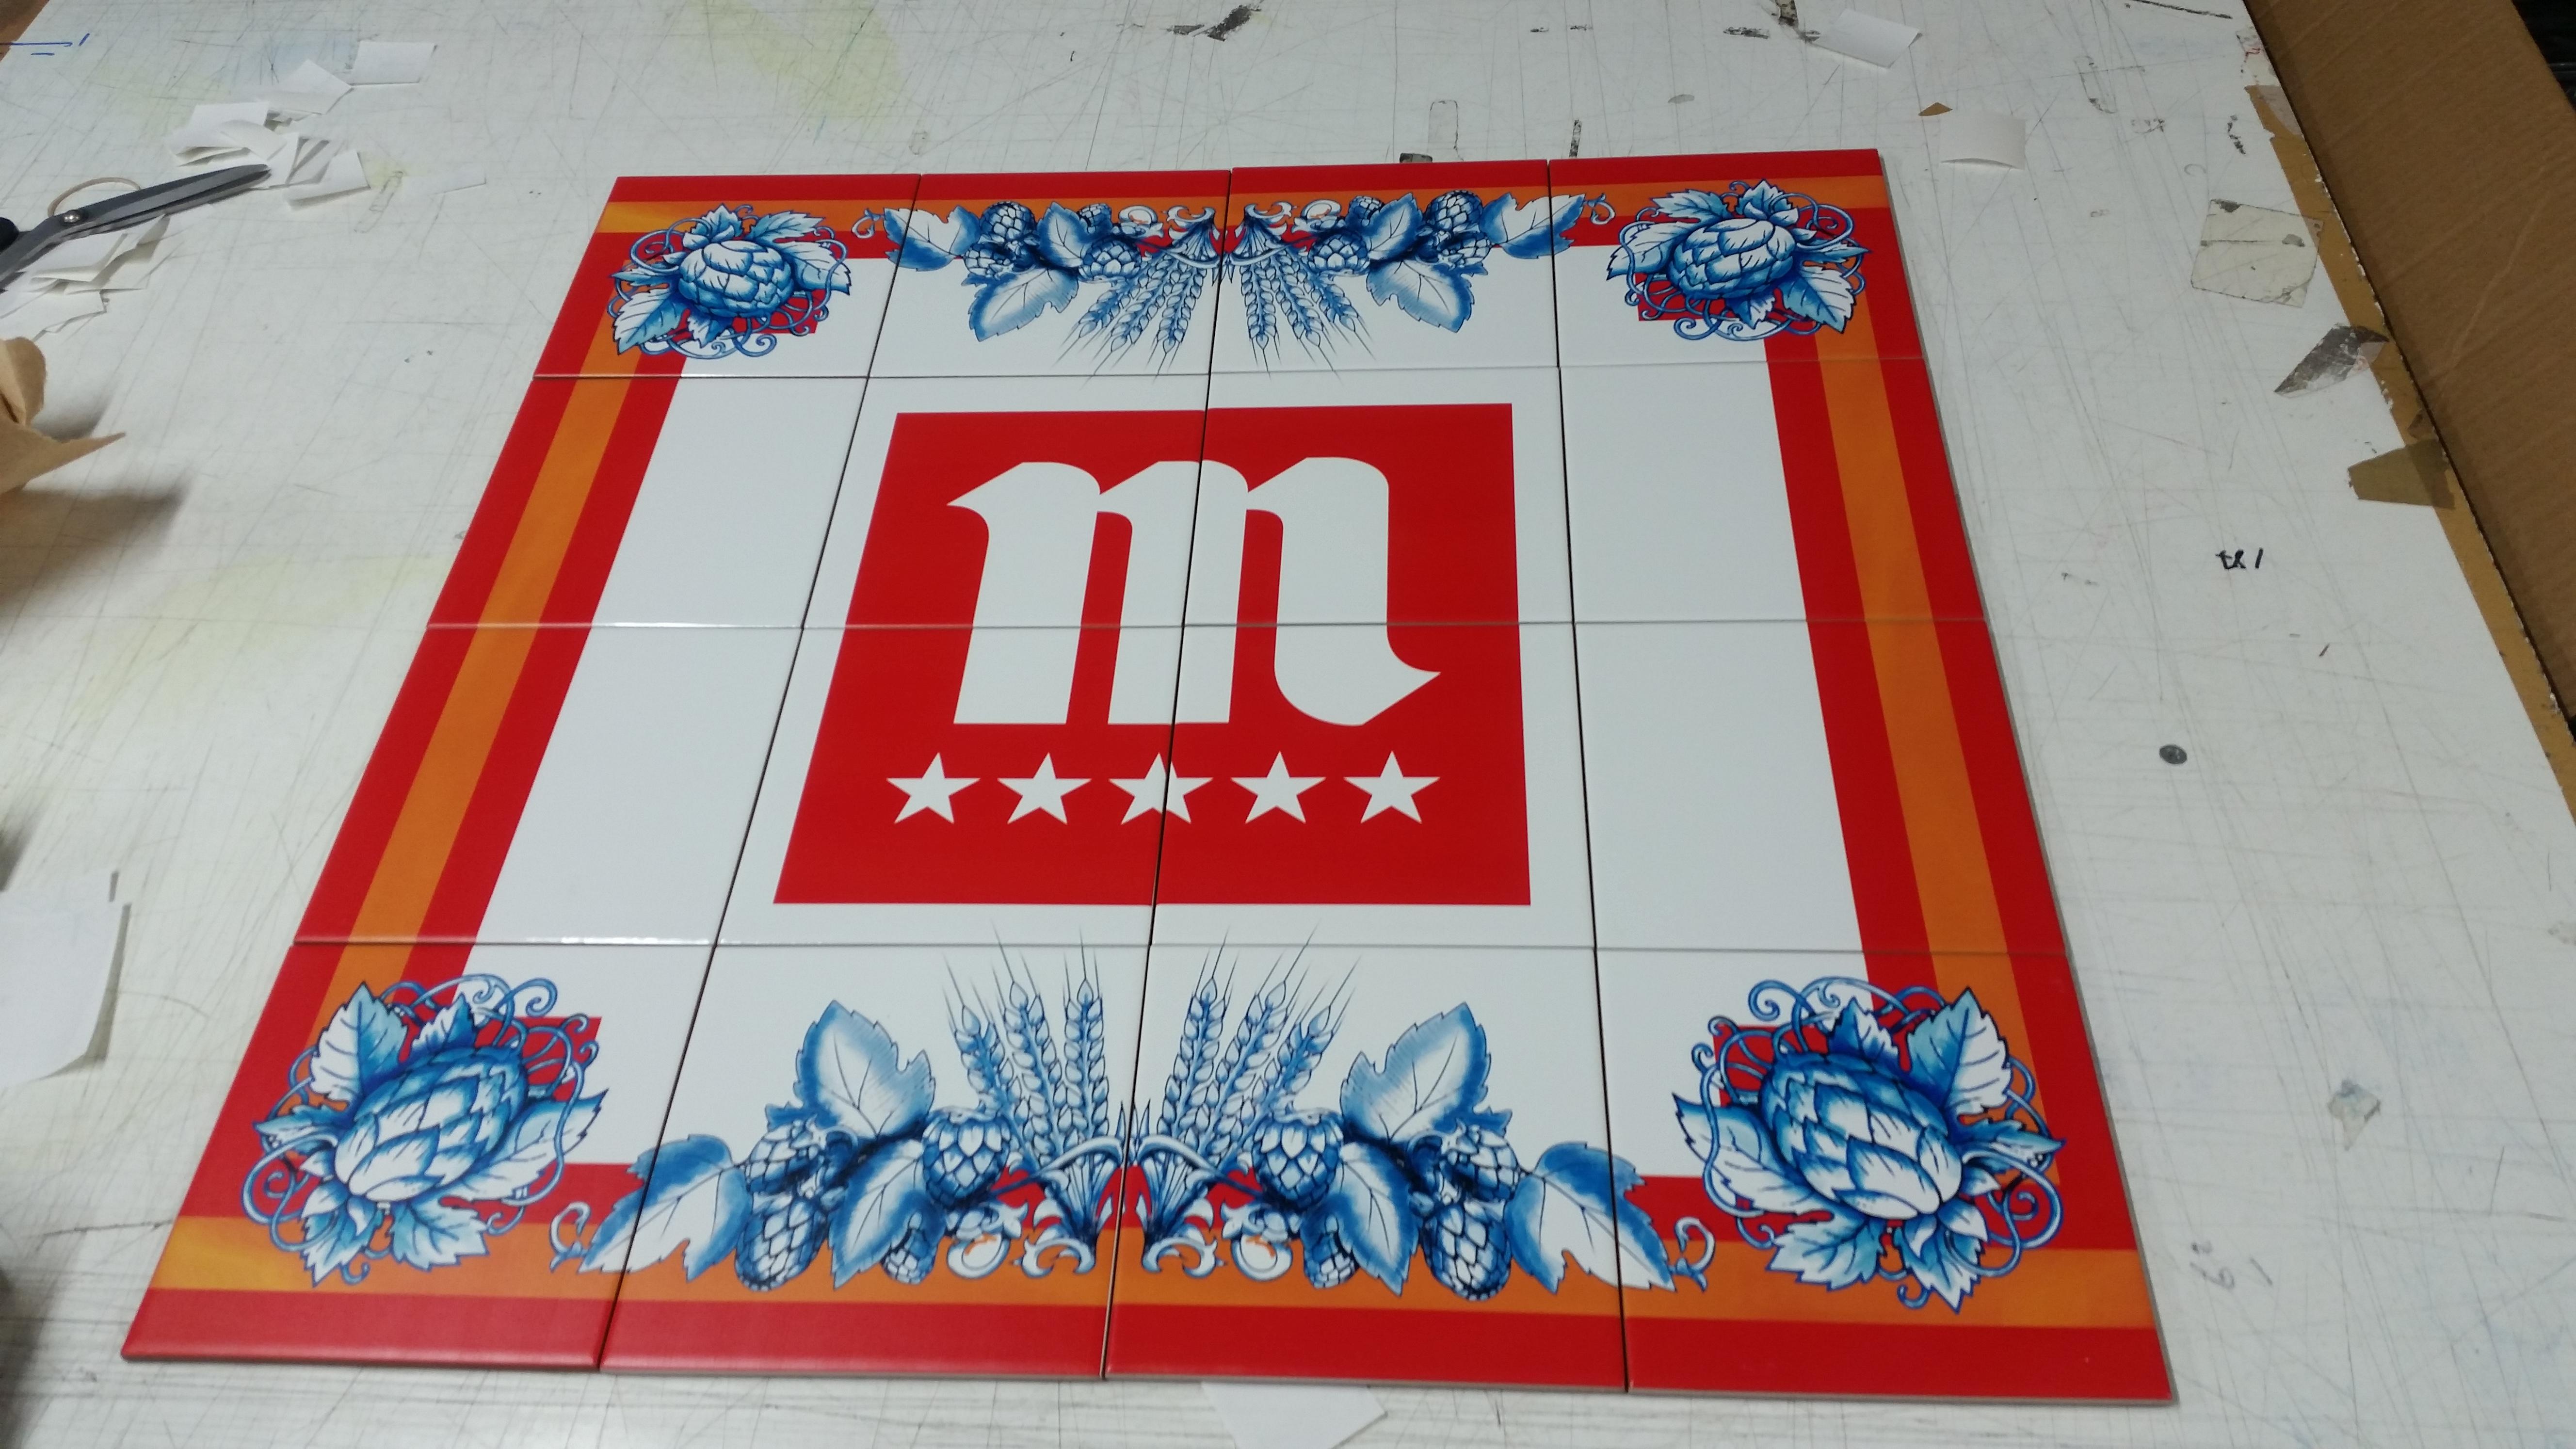 Impresión de azulejos